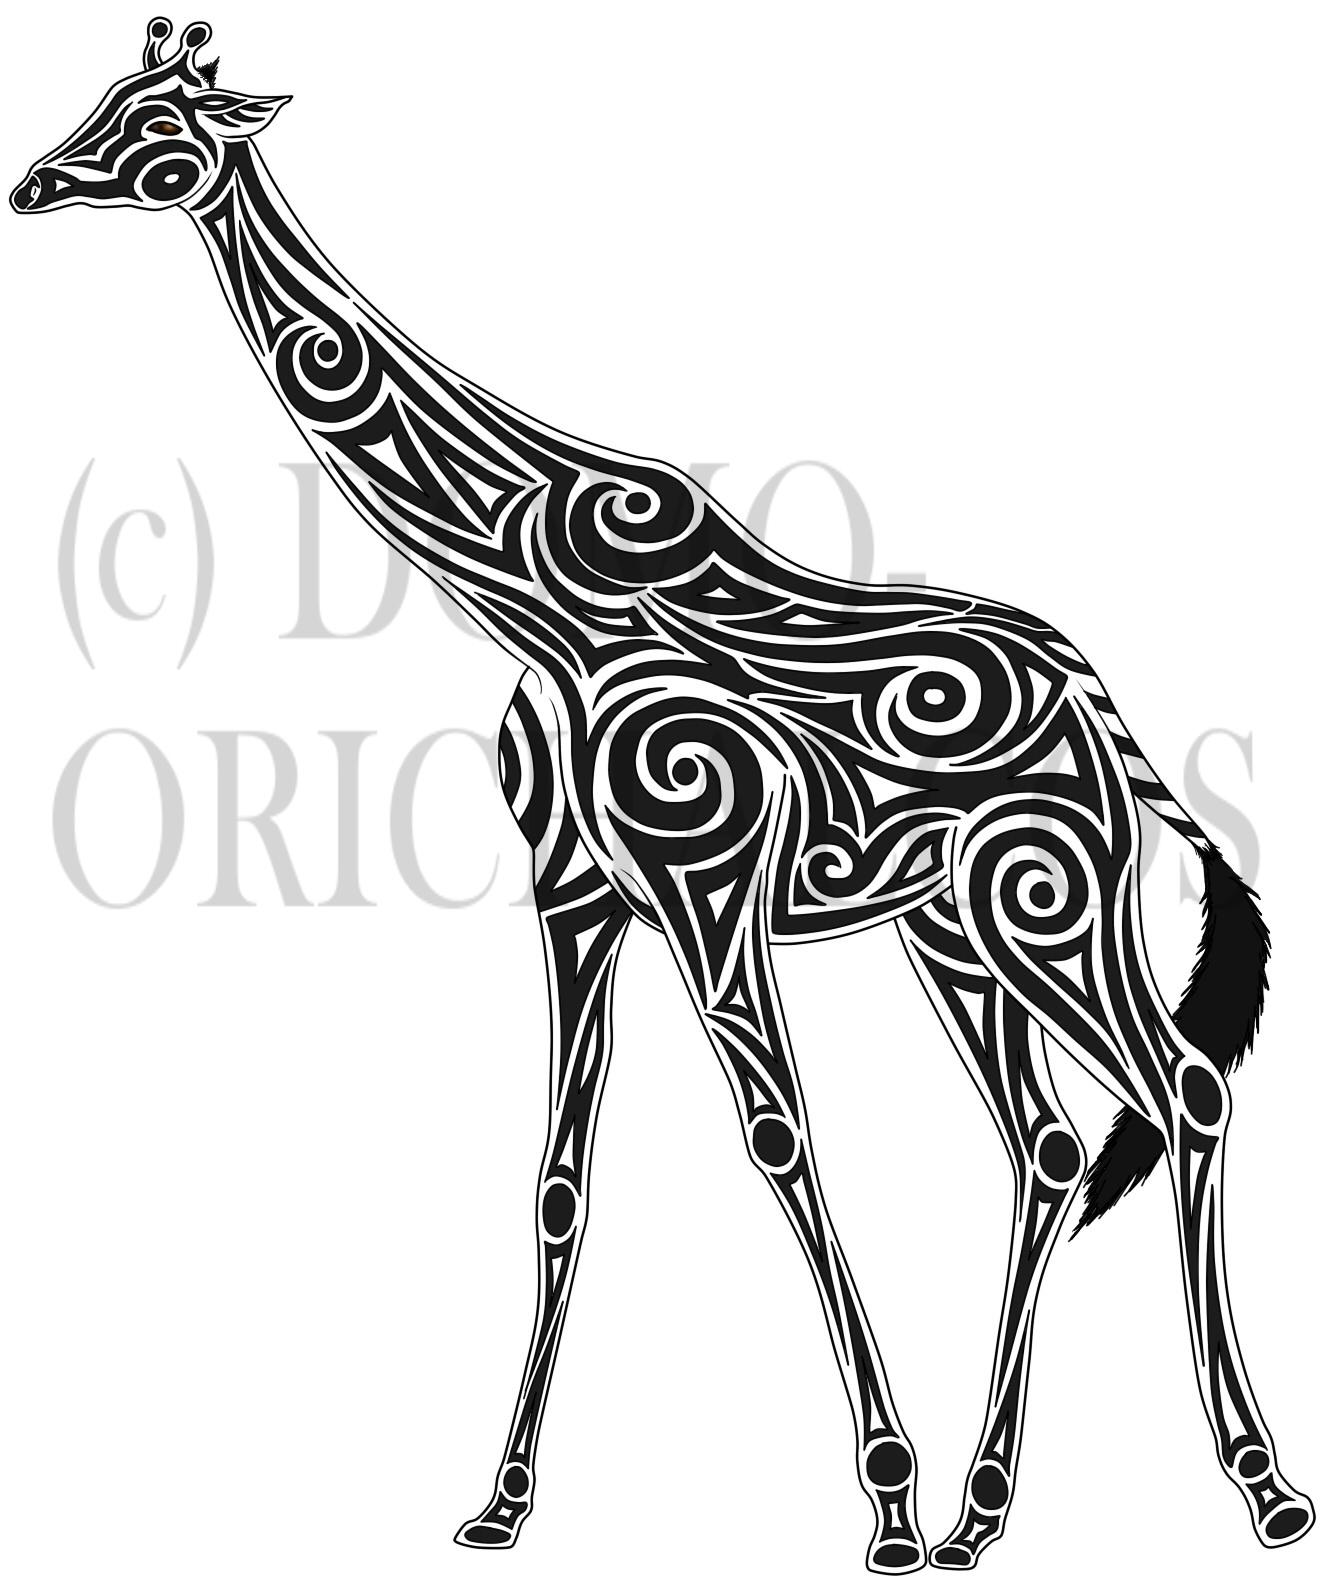 Tribal giraffe tattoo - photo#10